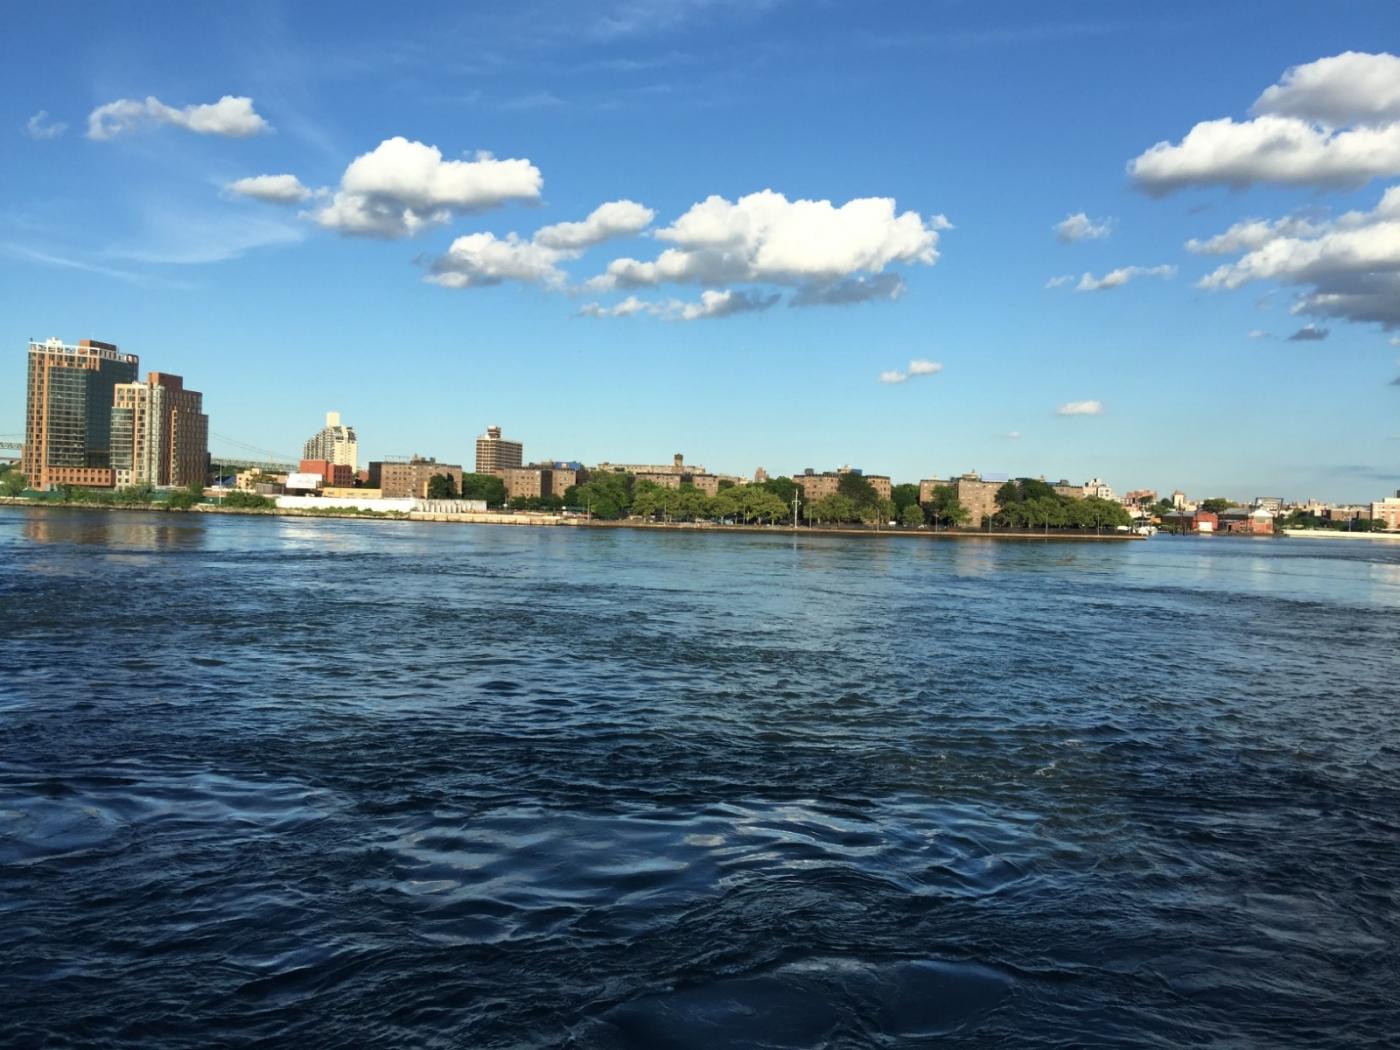 回头一瞅 美在东河 Manhattan East River_图1-7